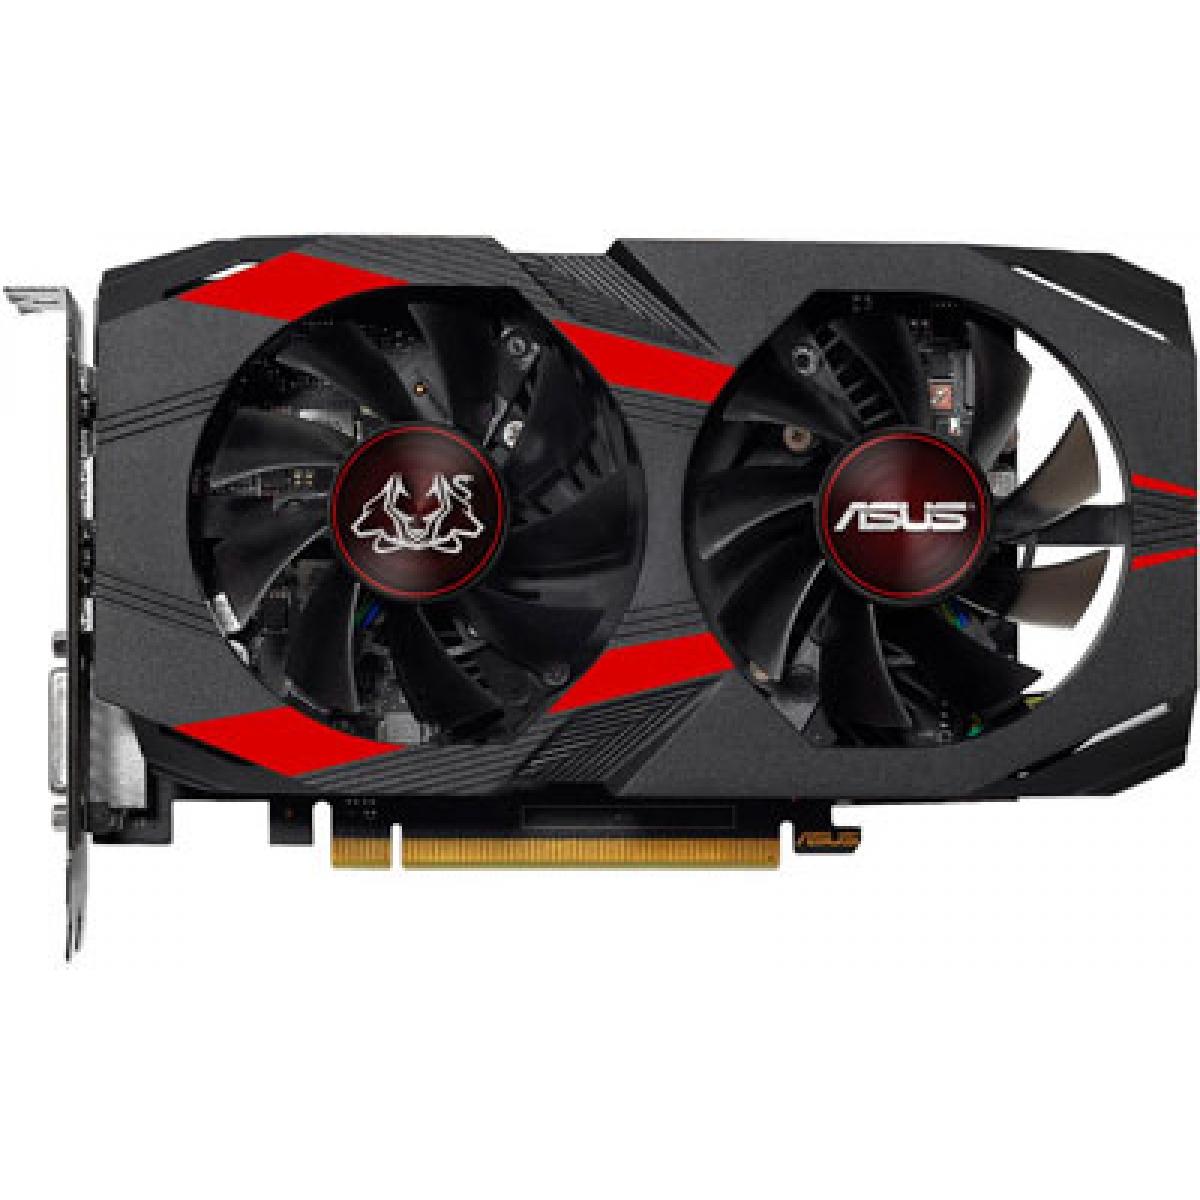 Placa de Video Asus, GeForce, GTX 1050 Ti Dual OC CERBERUS, 4GB, GDDR5, 128Bit, CERBERUS-GTX1050TI-O4G